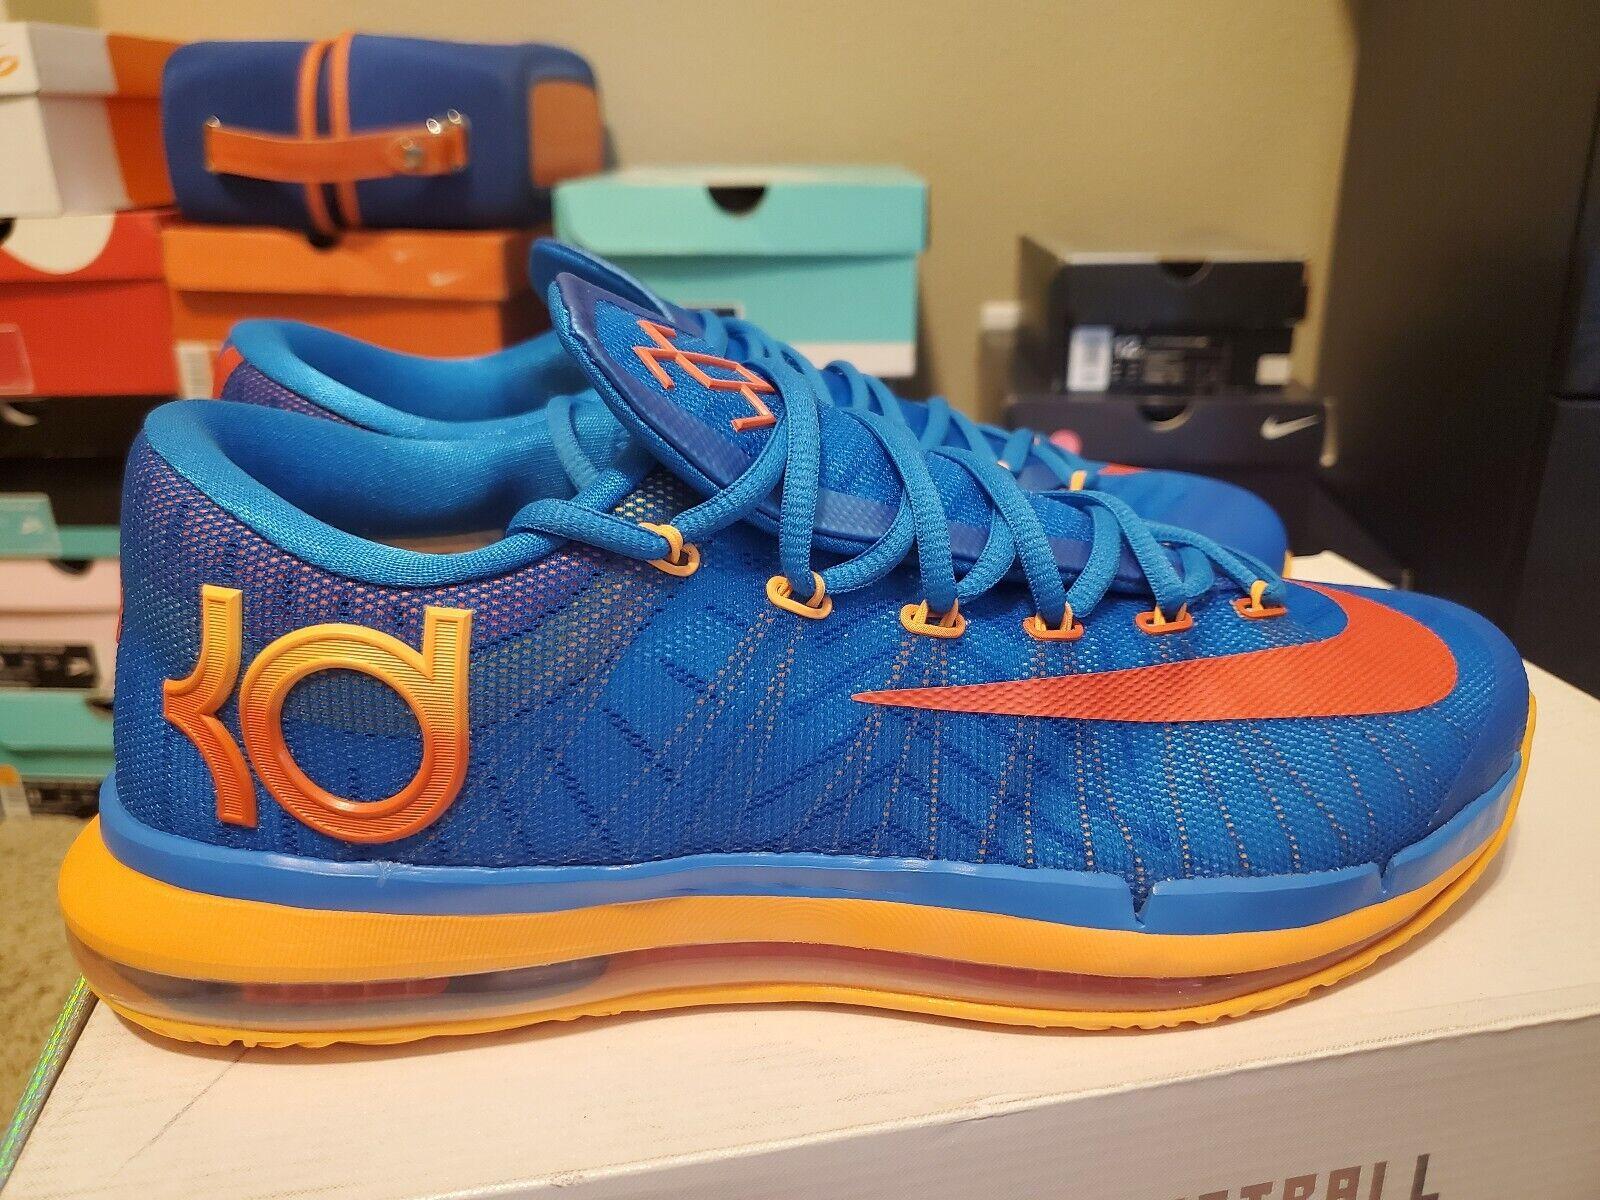 Size 11.5 - Nike KD 6 Elite Team for